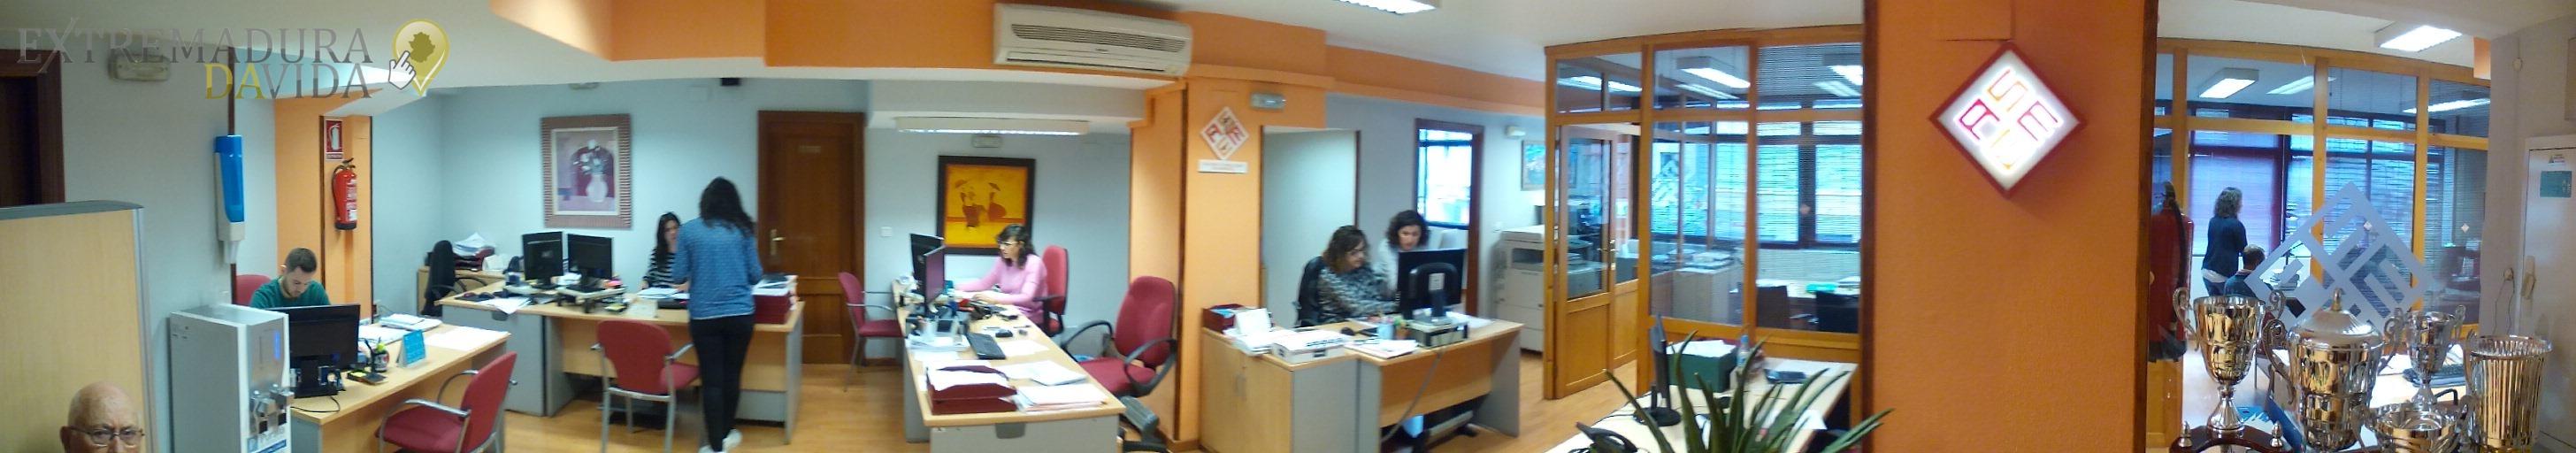 ASESORIA CONSULTORIA EN CACERES ASEM